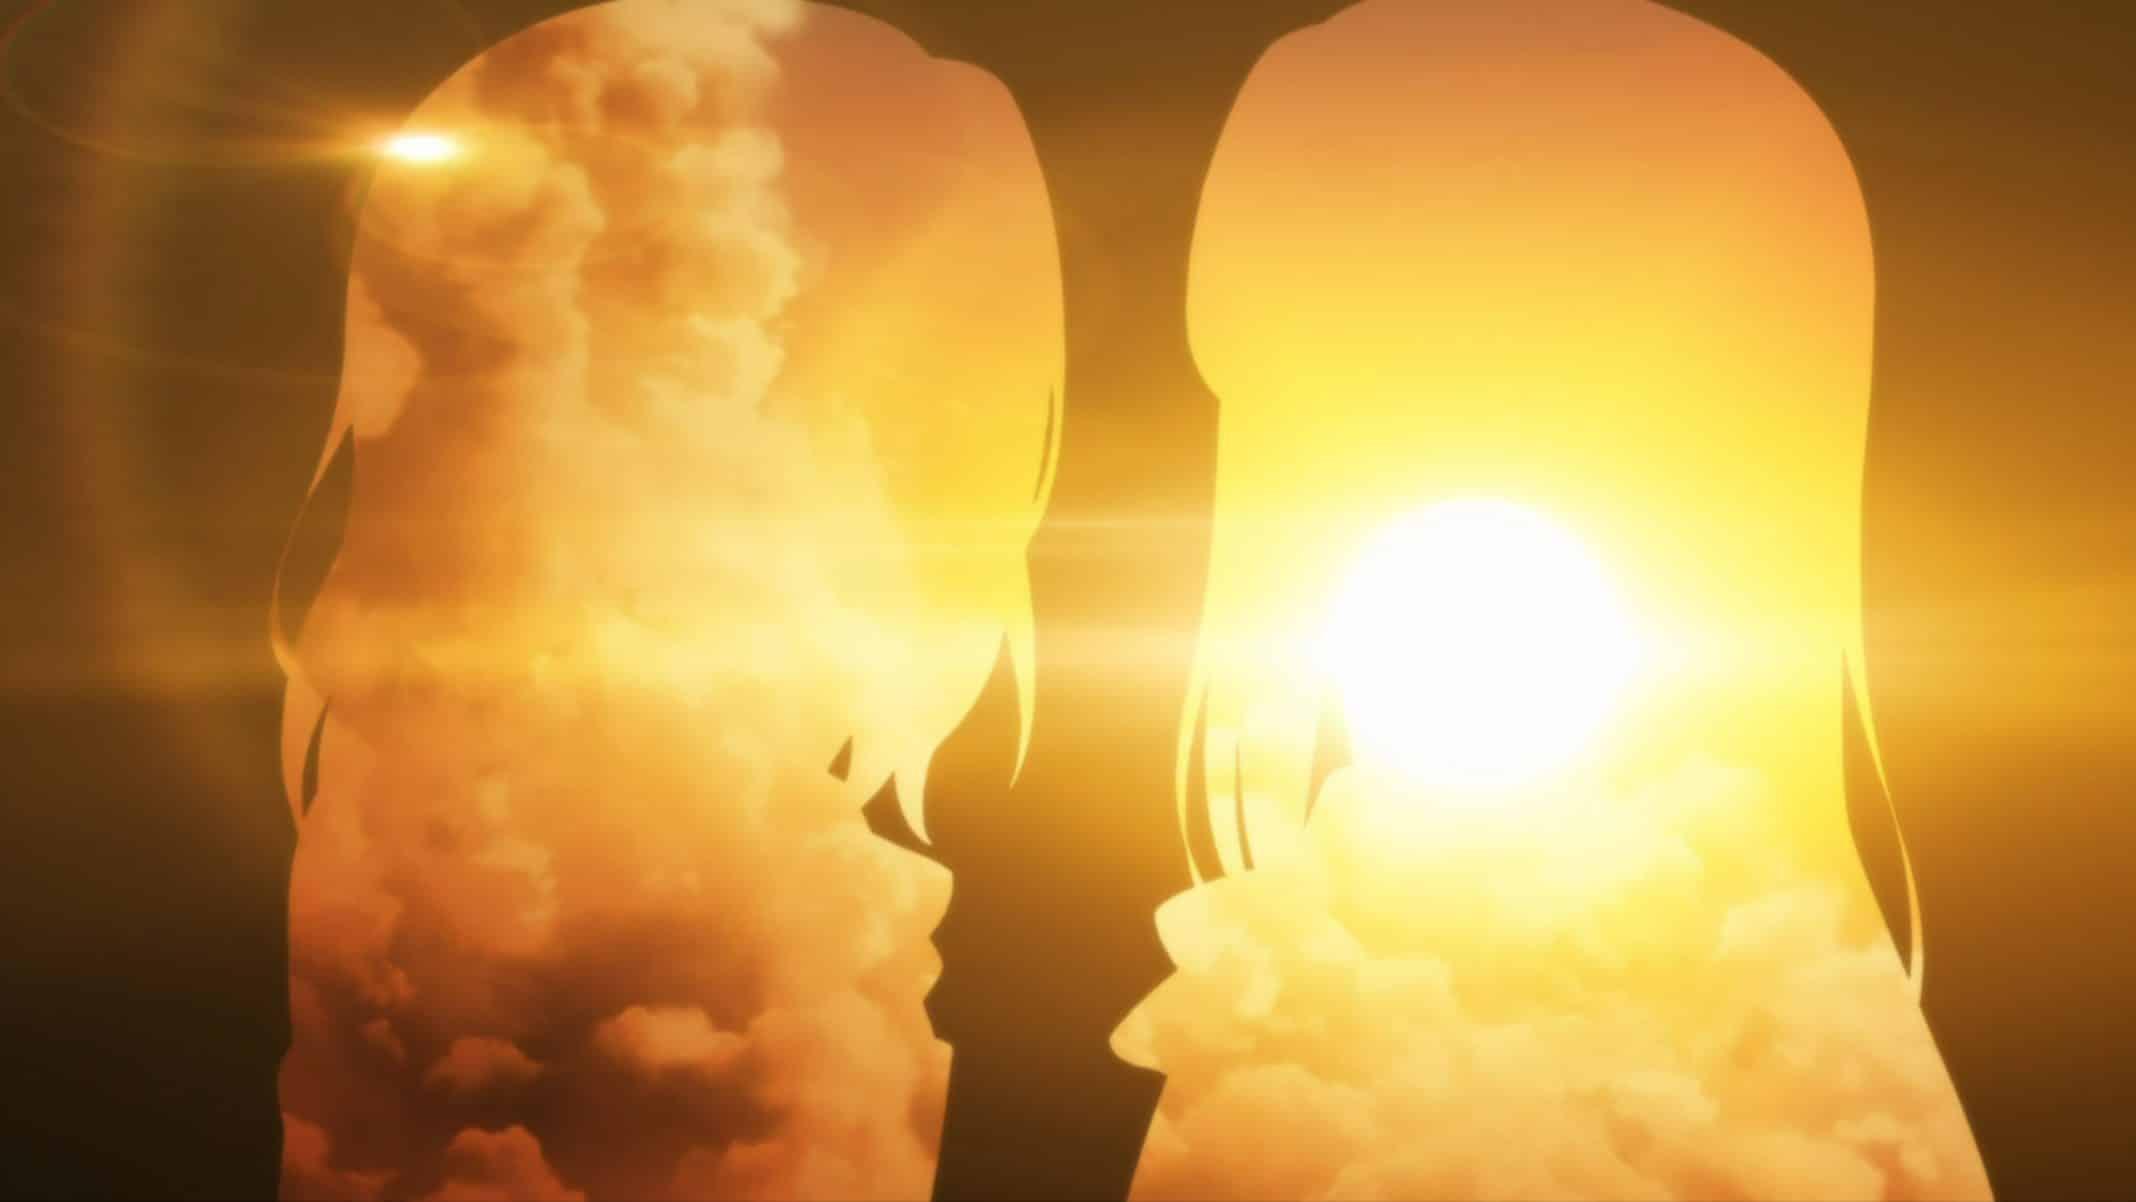 Adachi and Shimamura's silhouette.